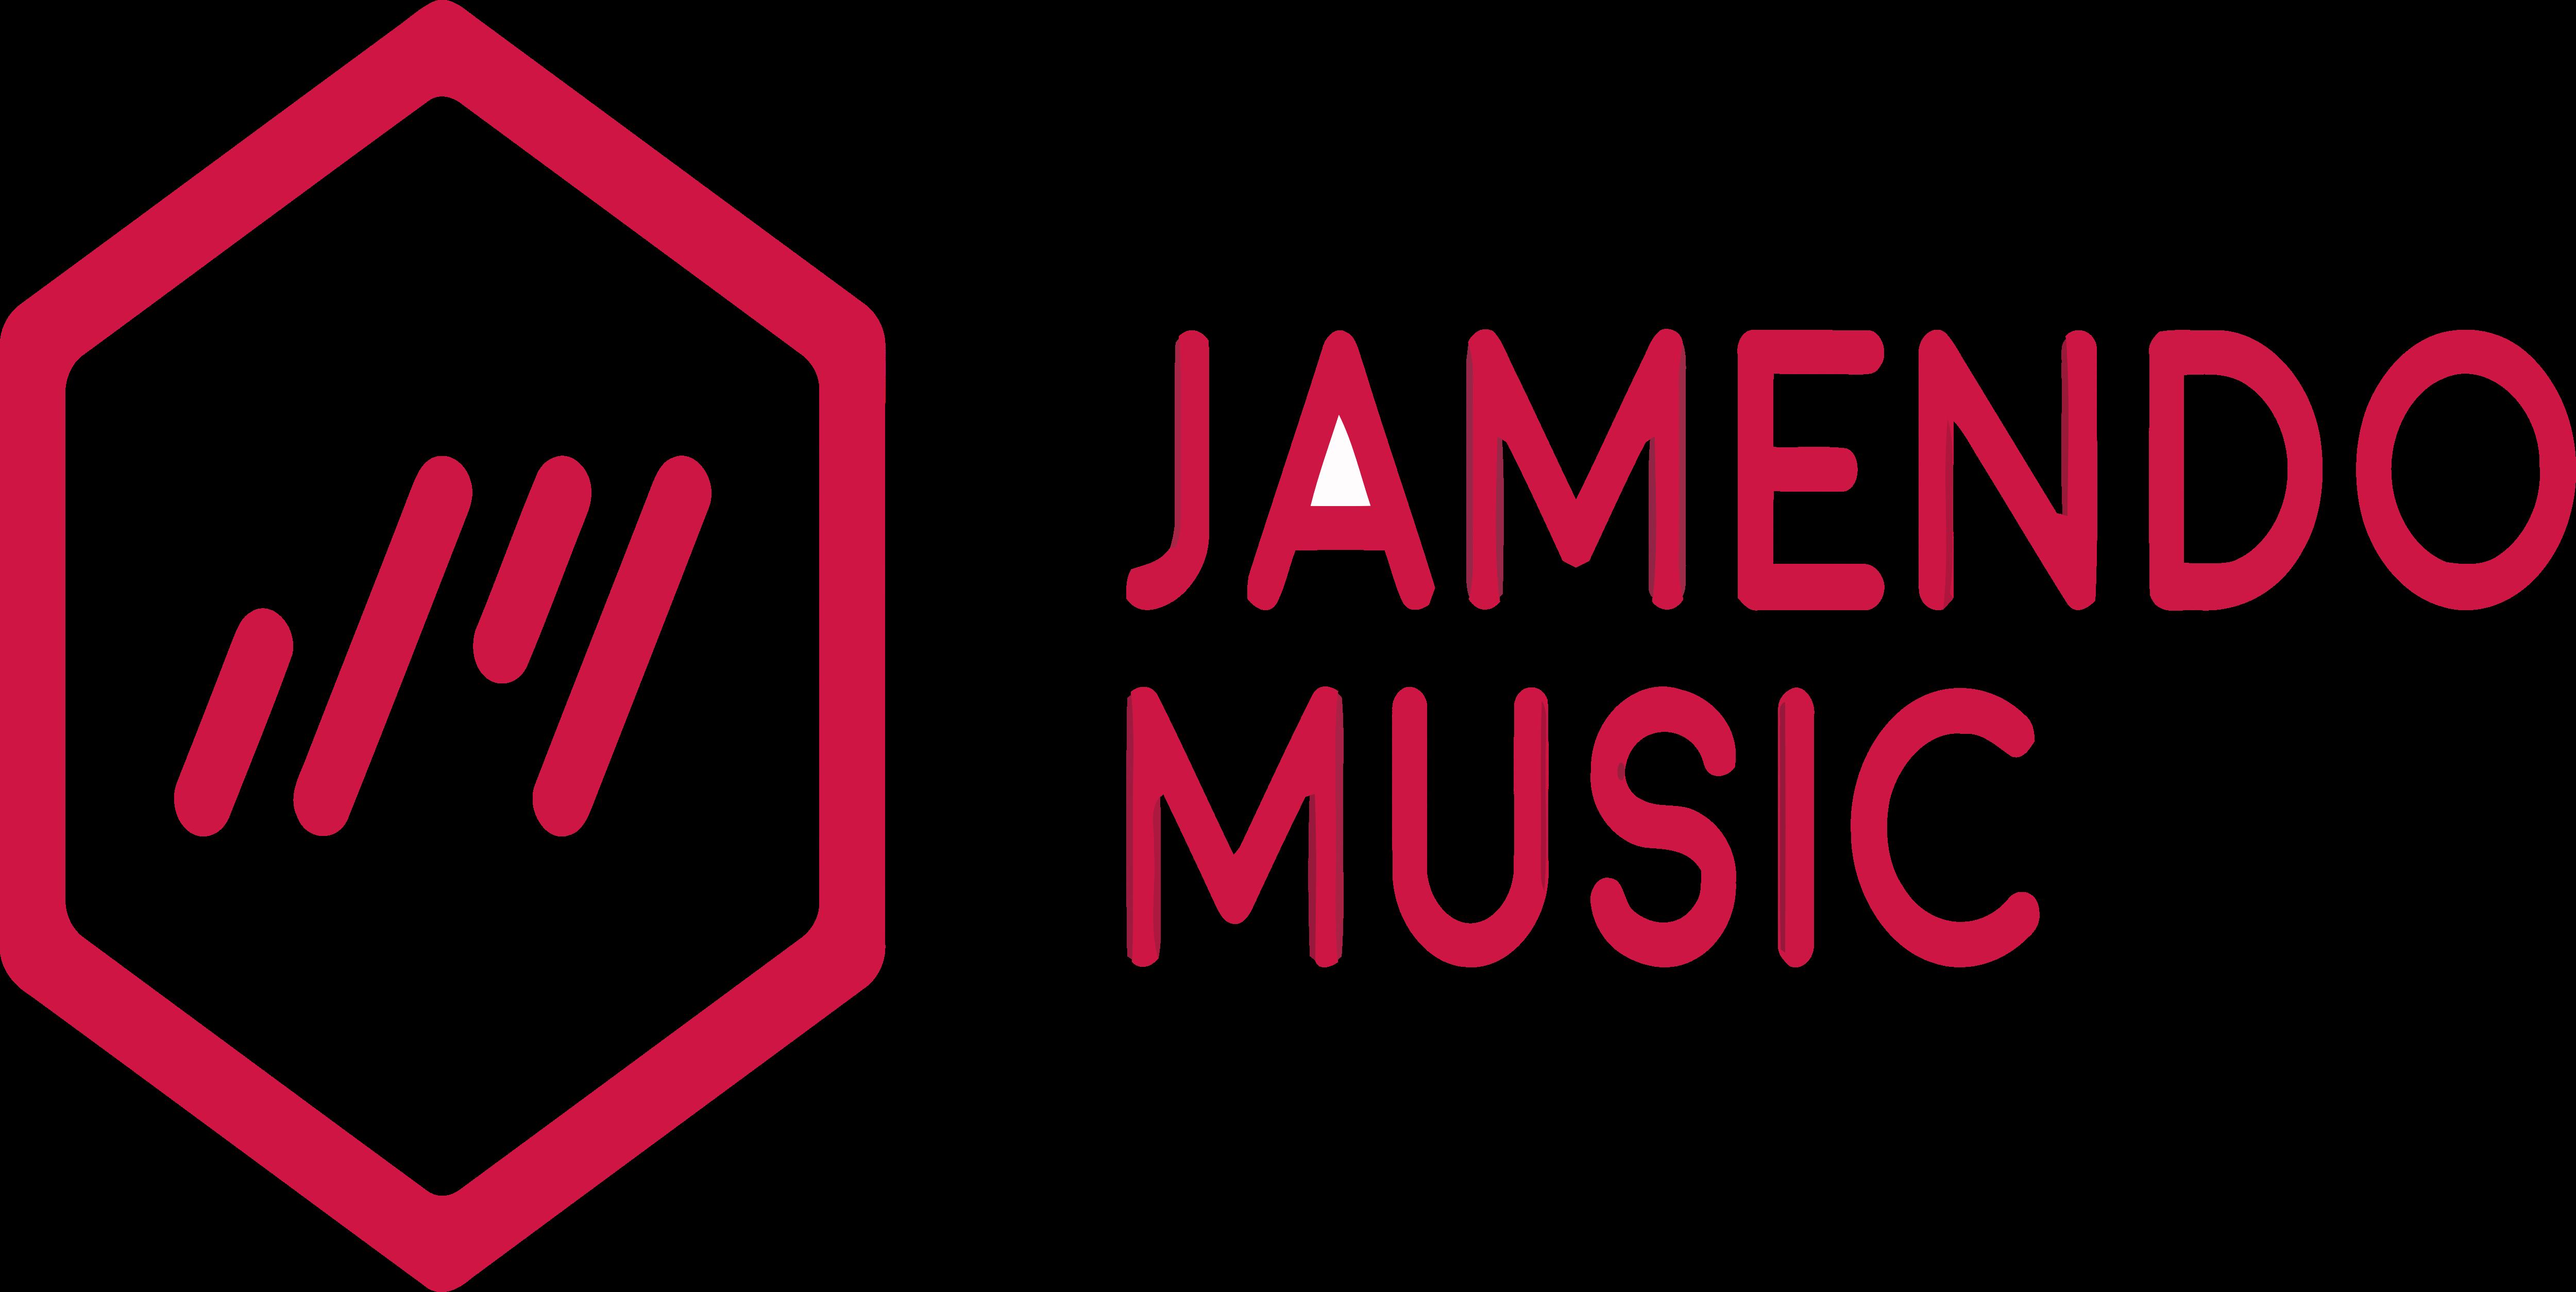 Jamendo Music \u2013 Logos Download